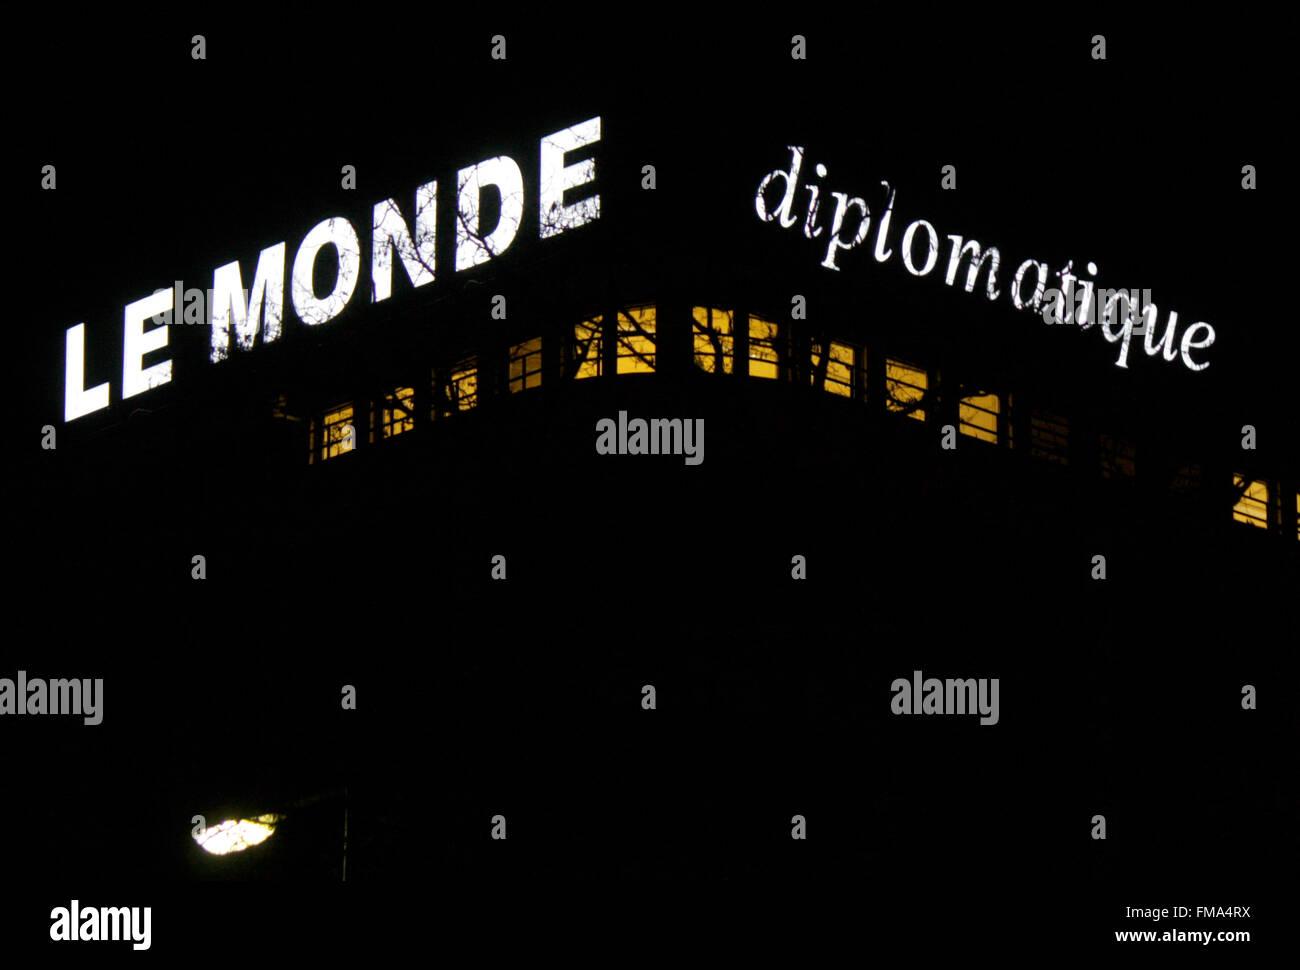 Markenname: 'Le Monde diplomatique', Dezember 2013, Berlin. - Stock Image